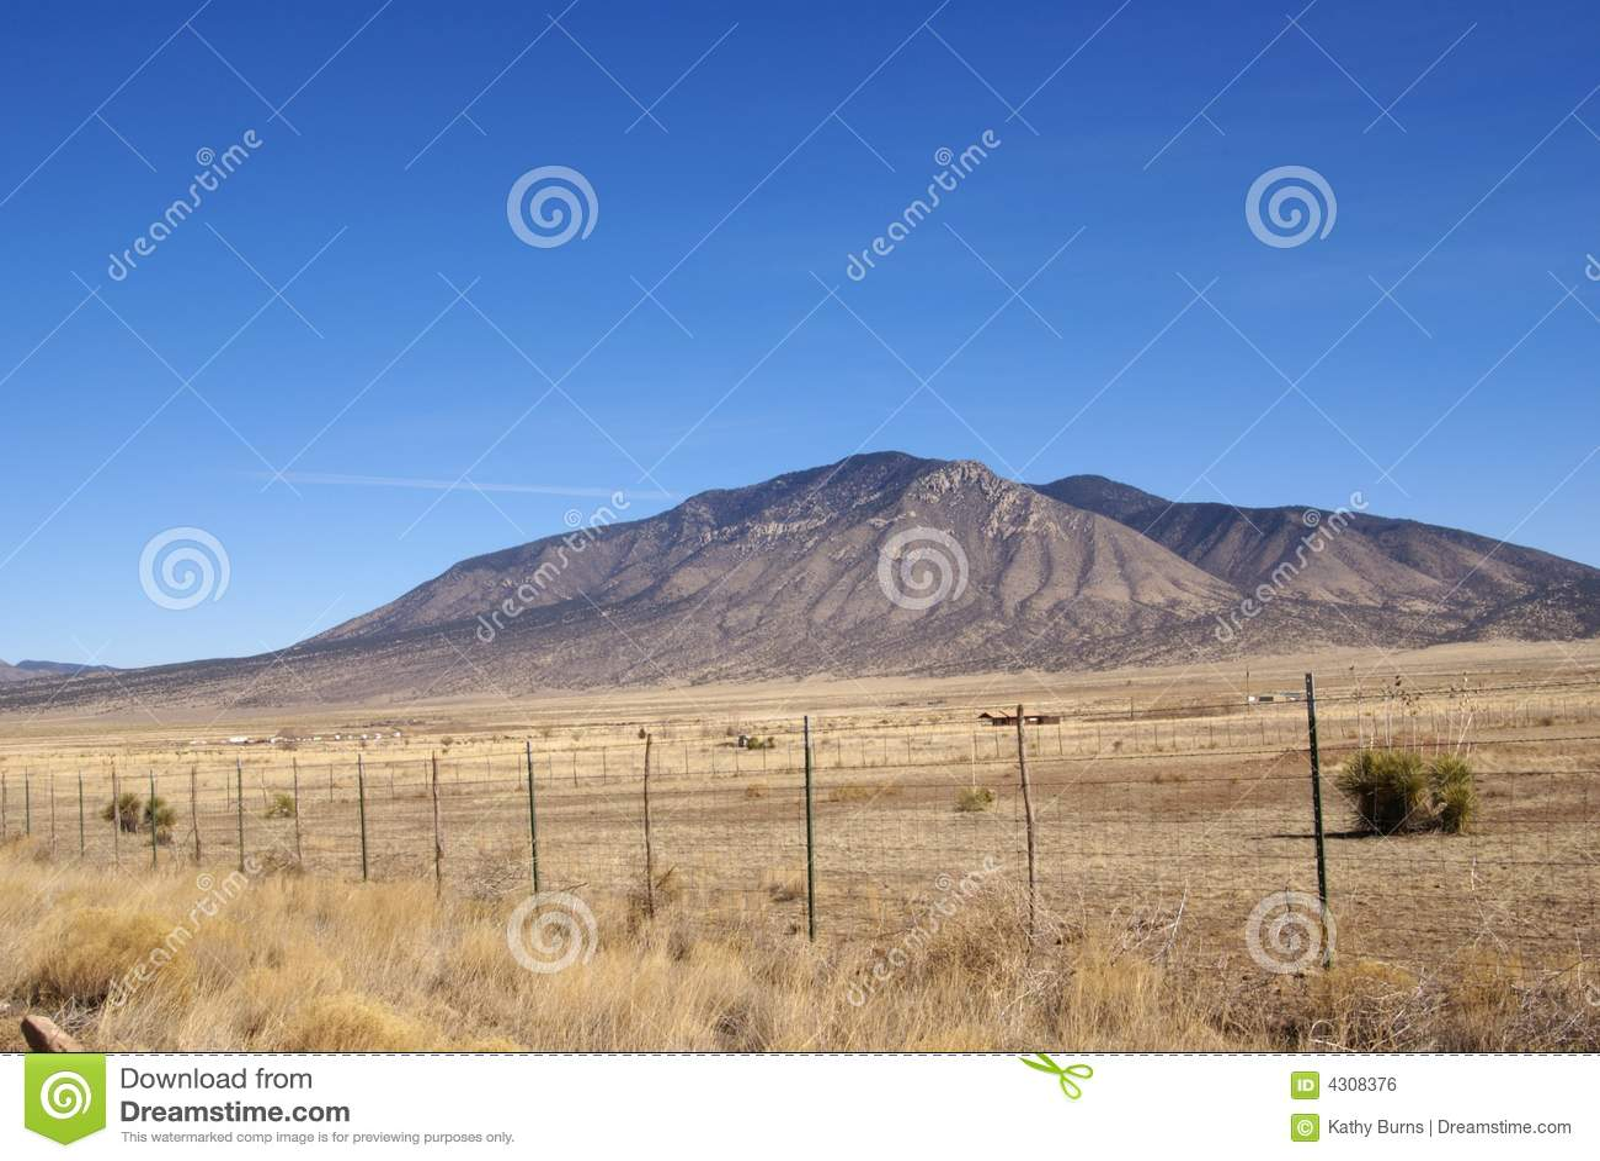 New Mexico Scenery